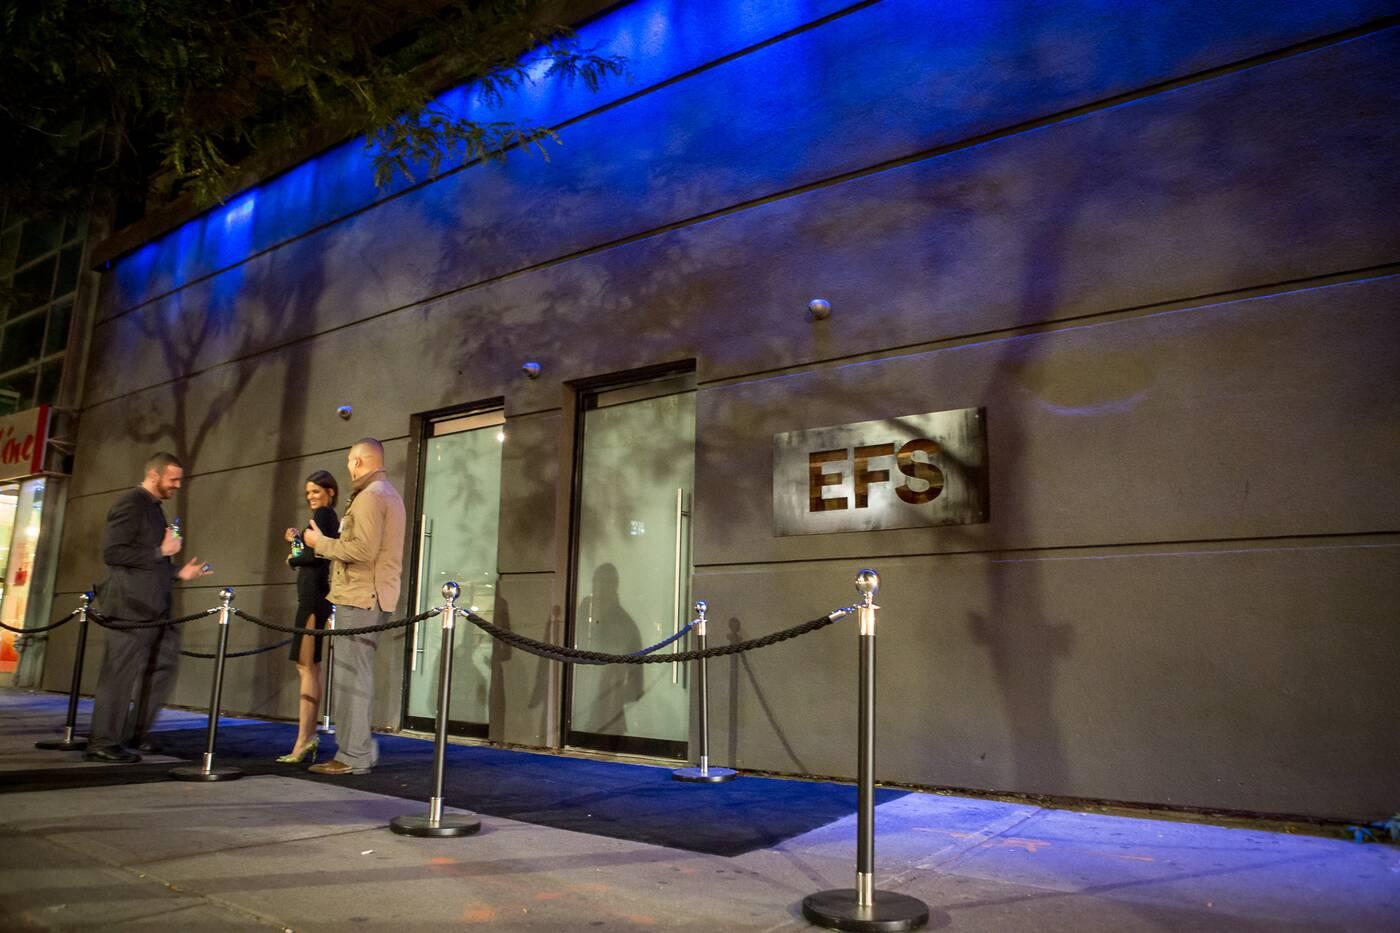 EFS Toronto